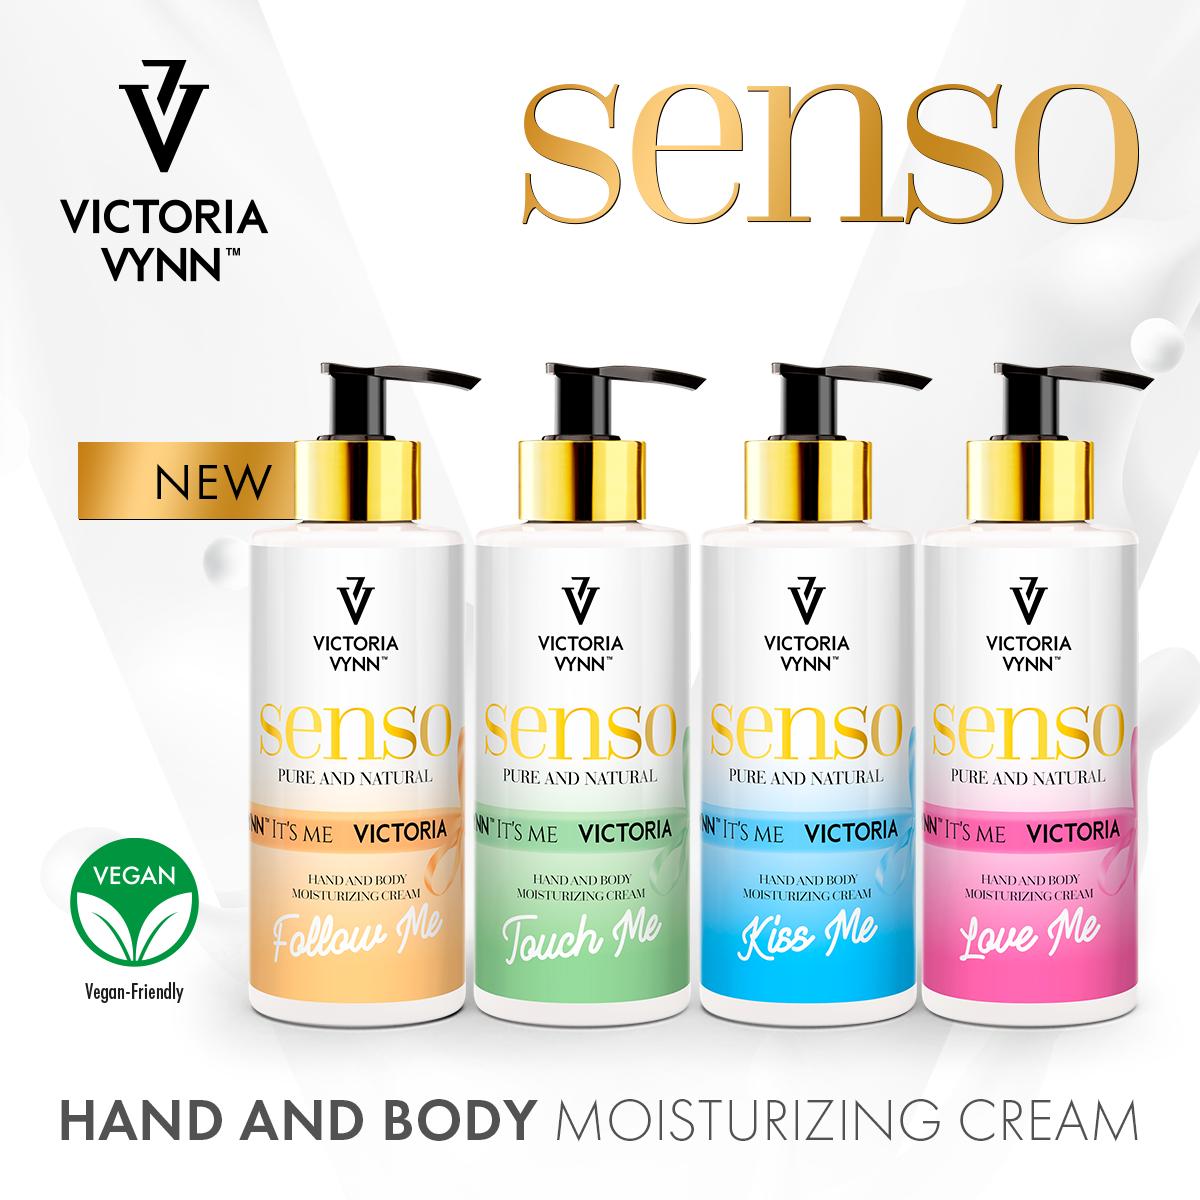 Victoria Vynn Pack 4 cremes Senso